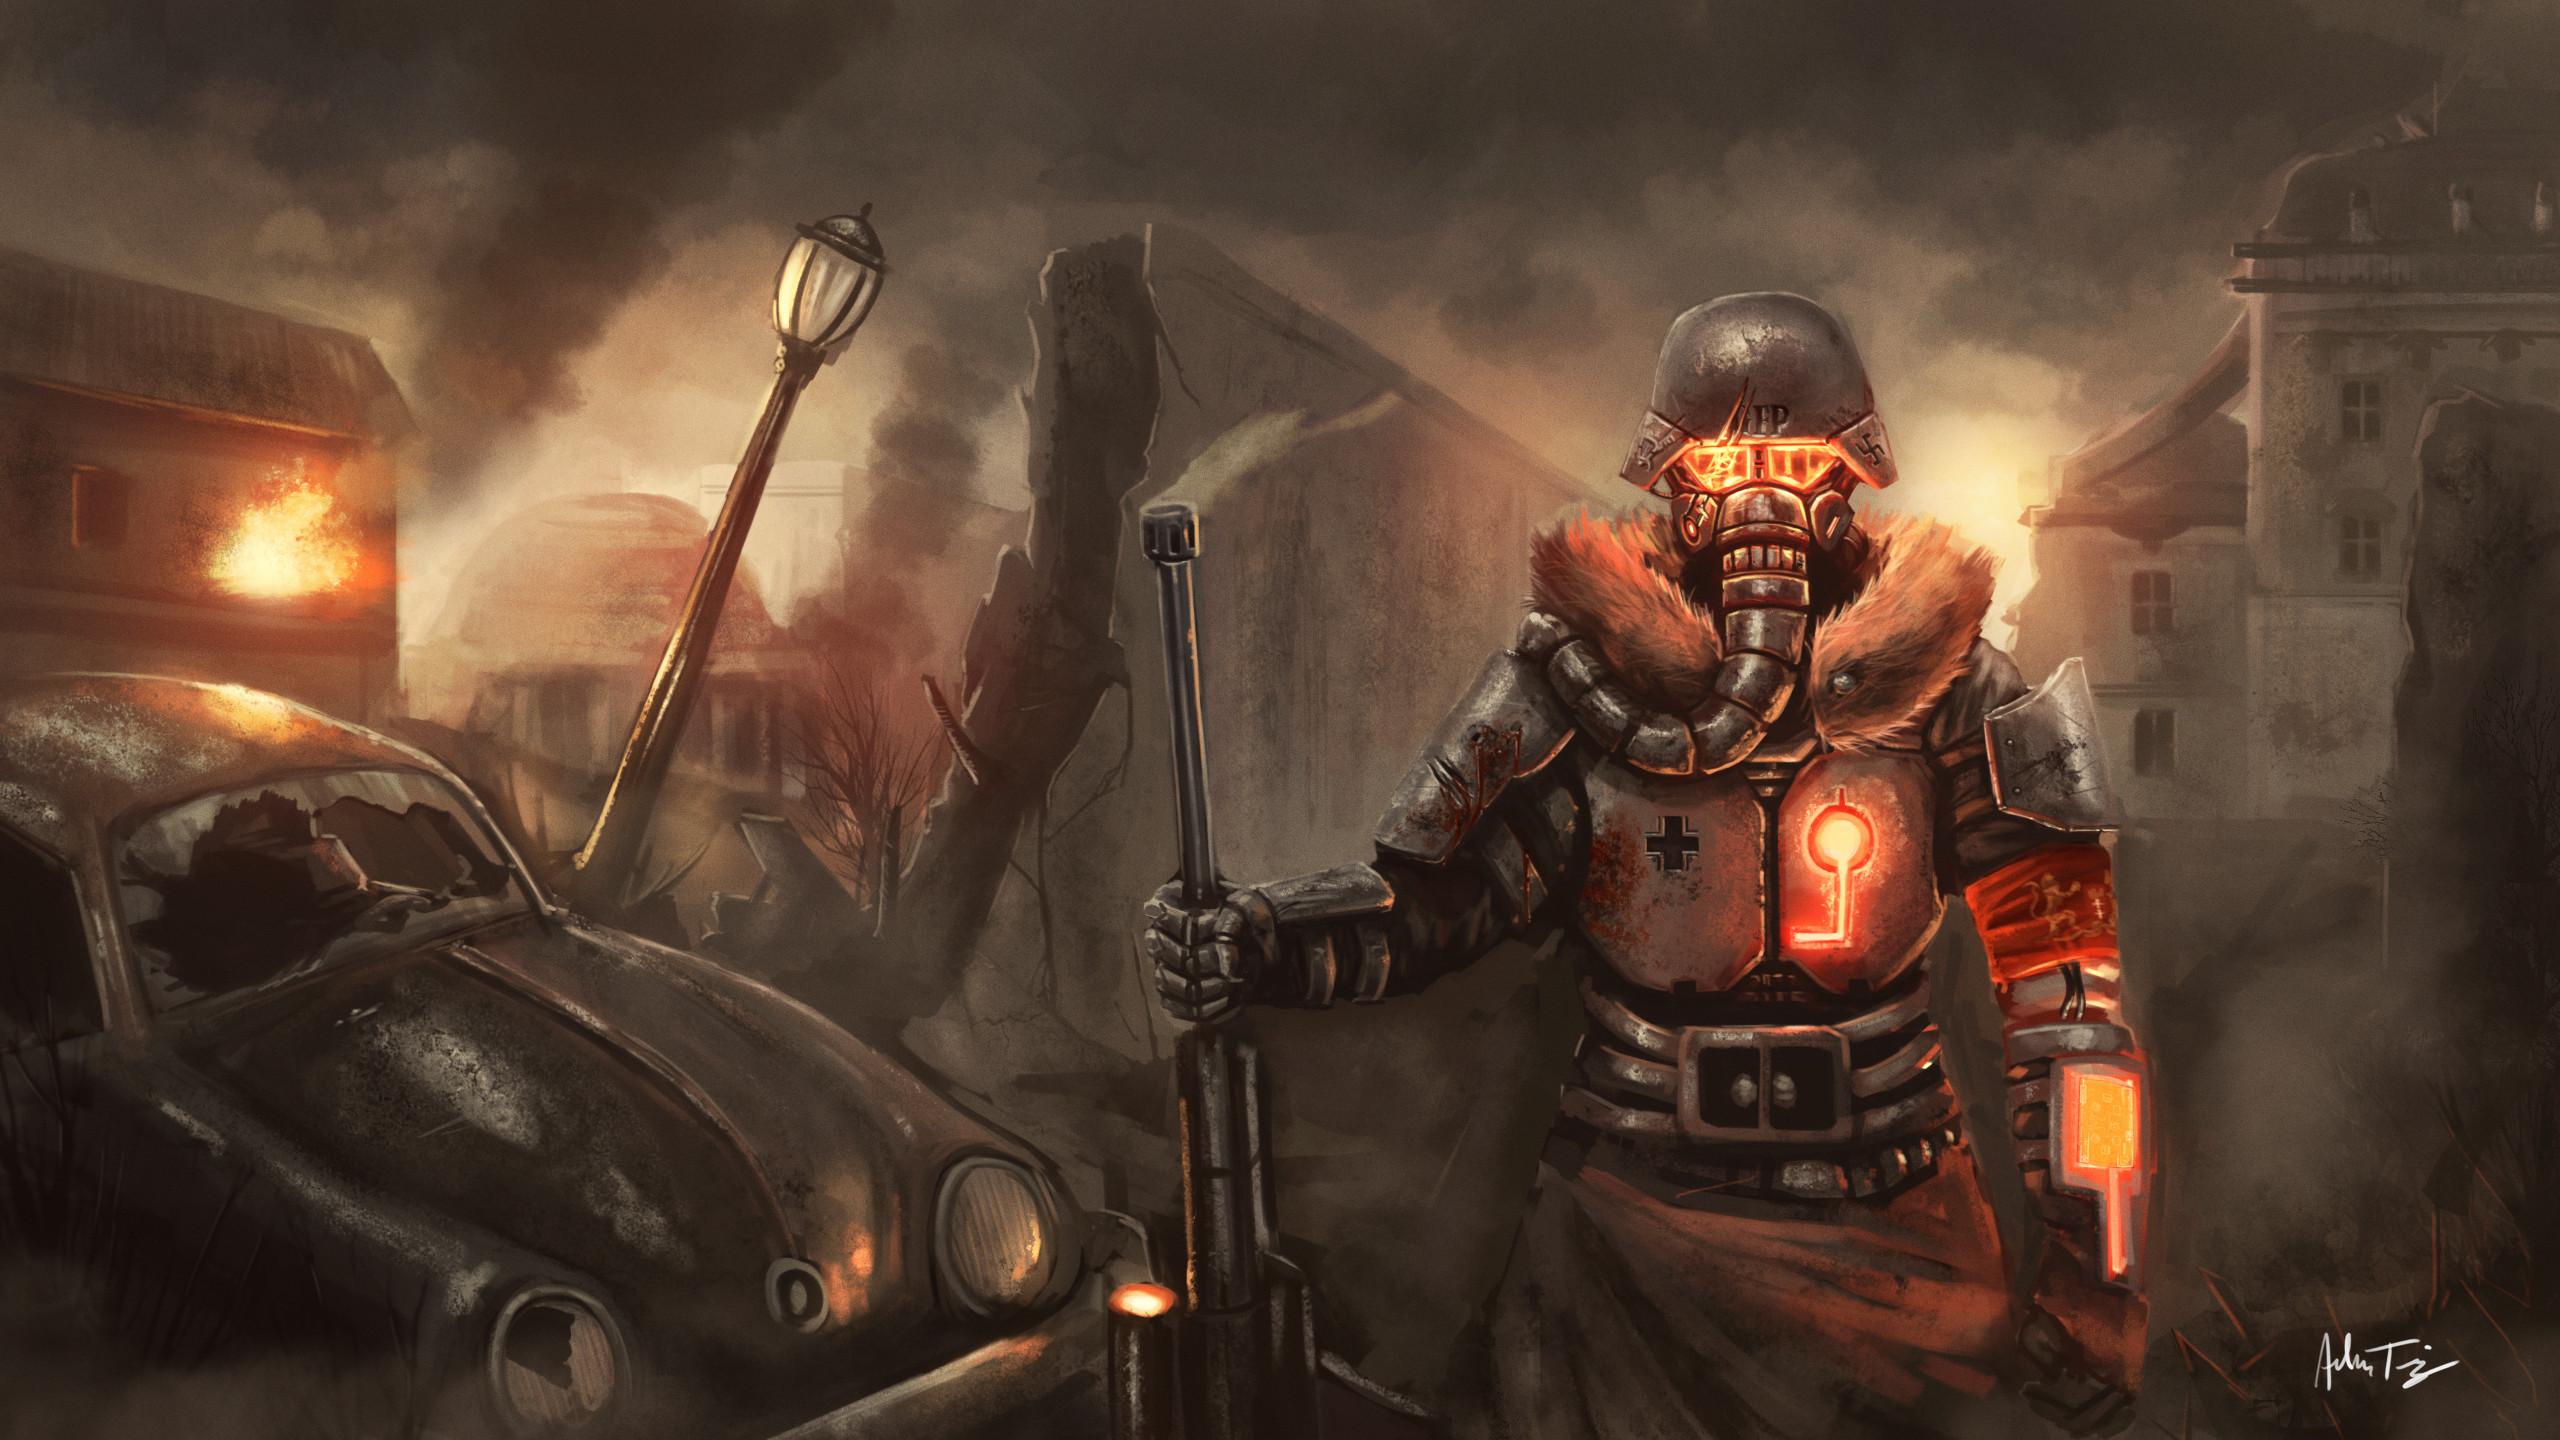 Video Game – Fallout Wallpaper